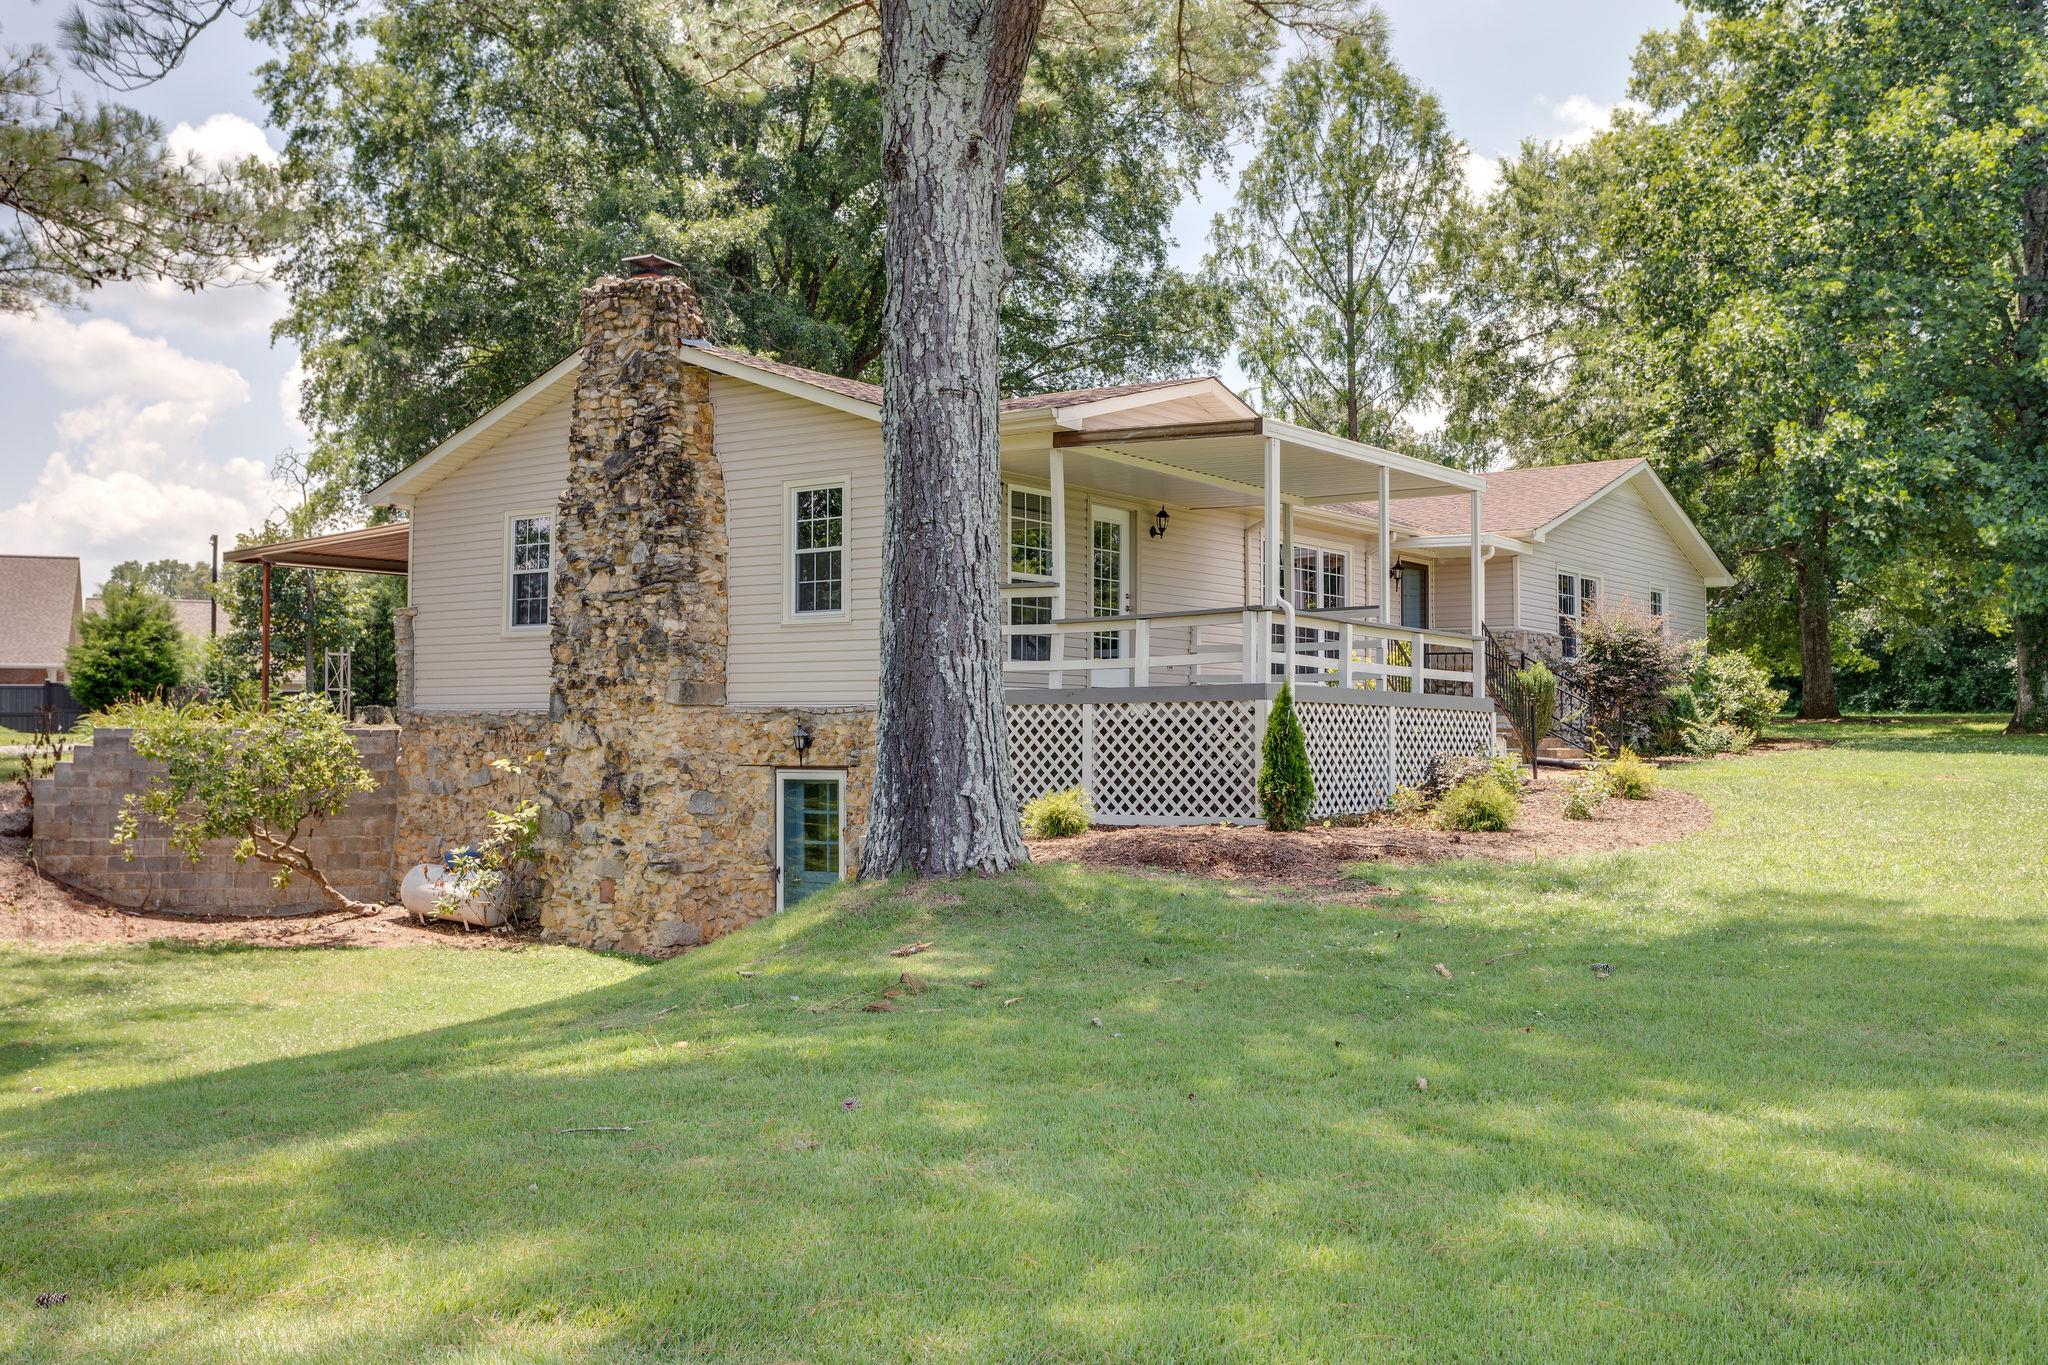 405 Walden Rd, Lawrenceburg, TN 38464 - Lawrenceburg, TN real estate listing